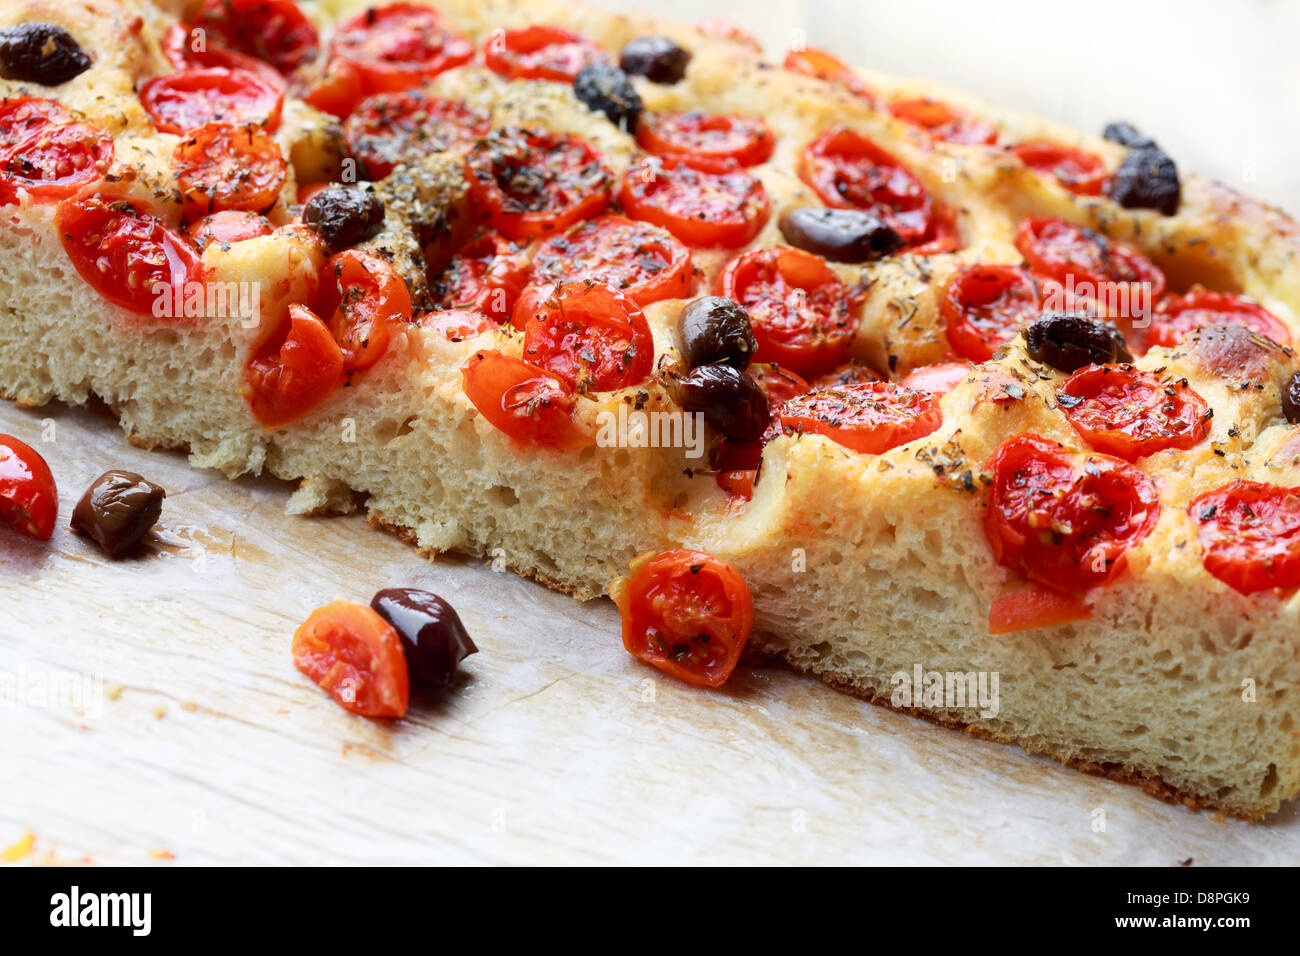 Focaccia pugliese - Fresh baked focaccia bread - Stock Image